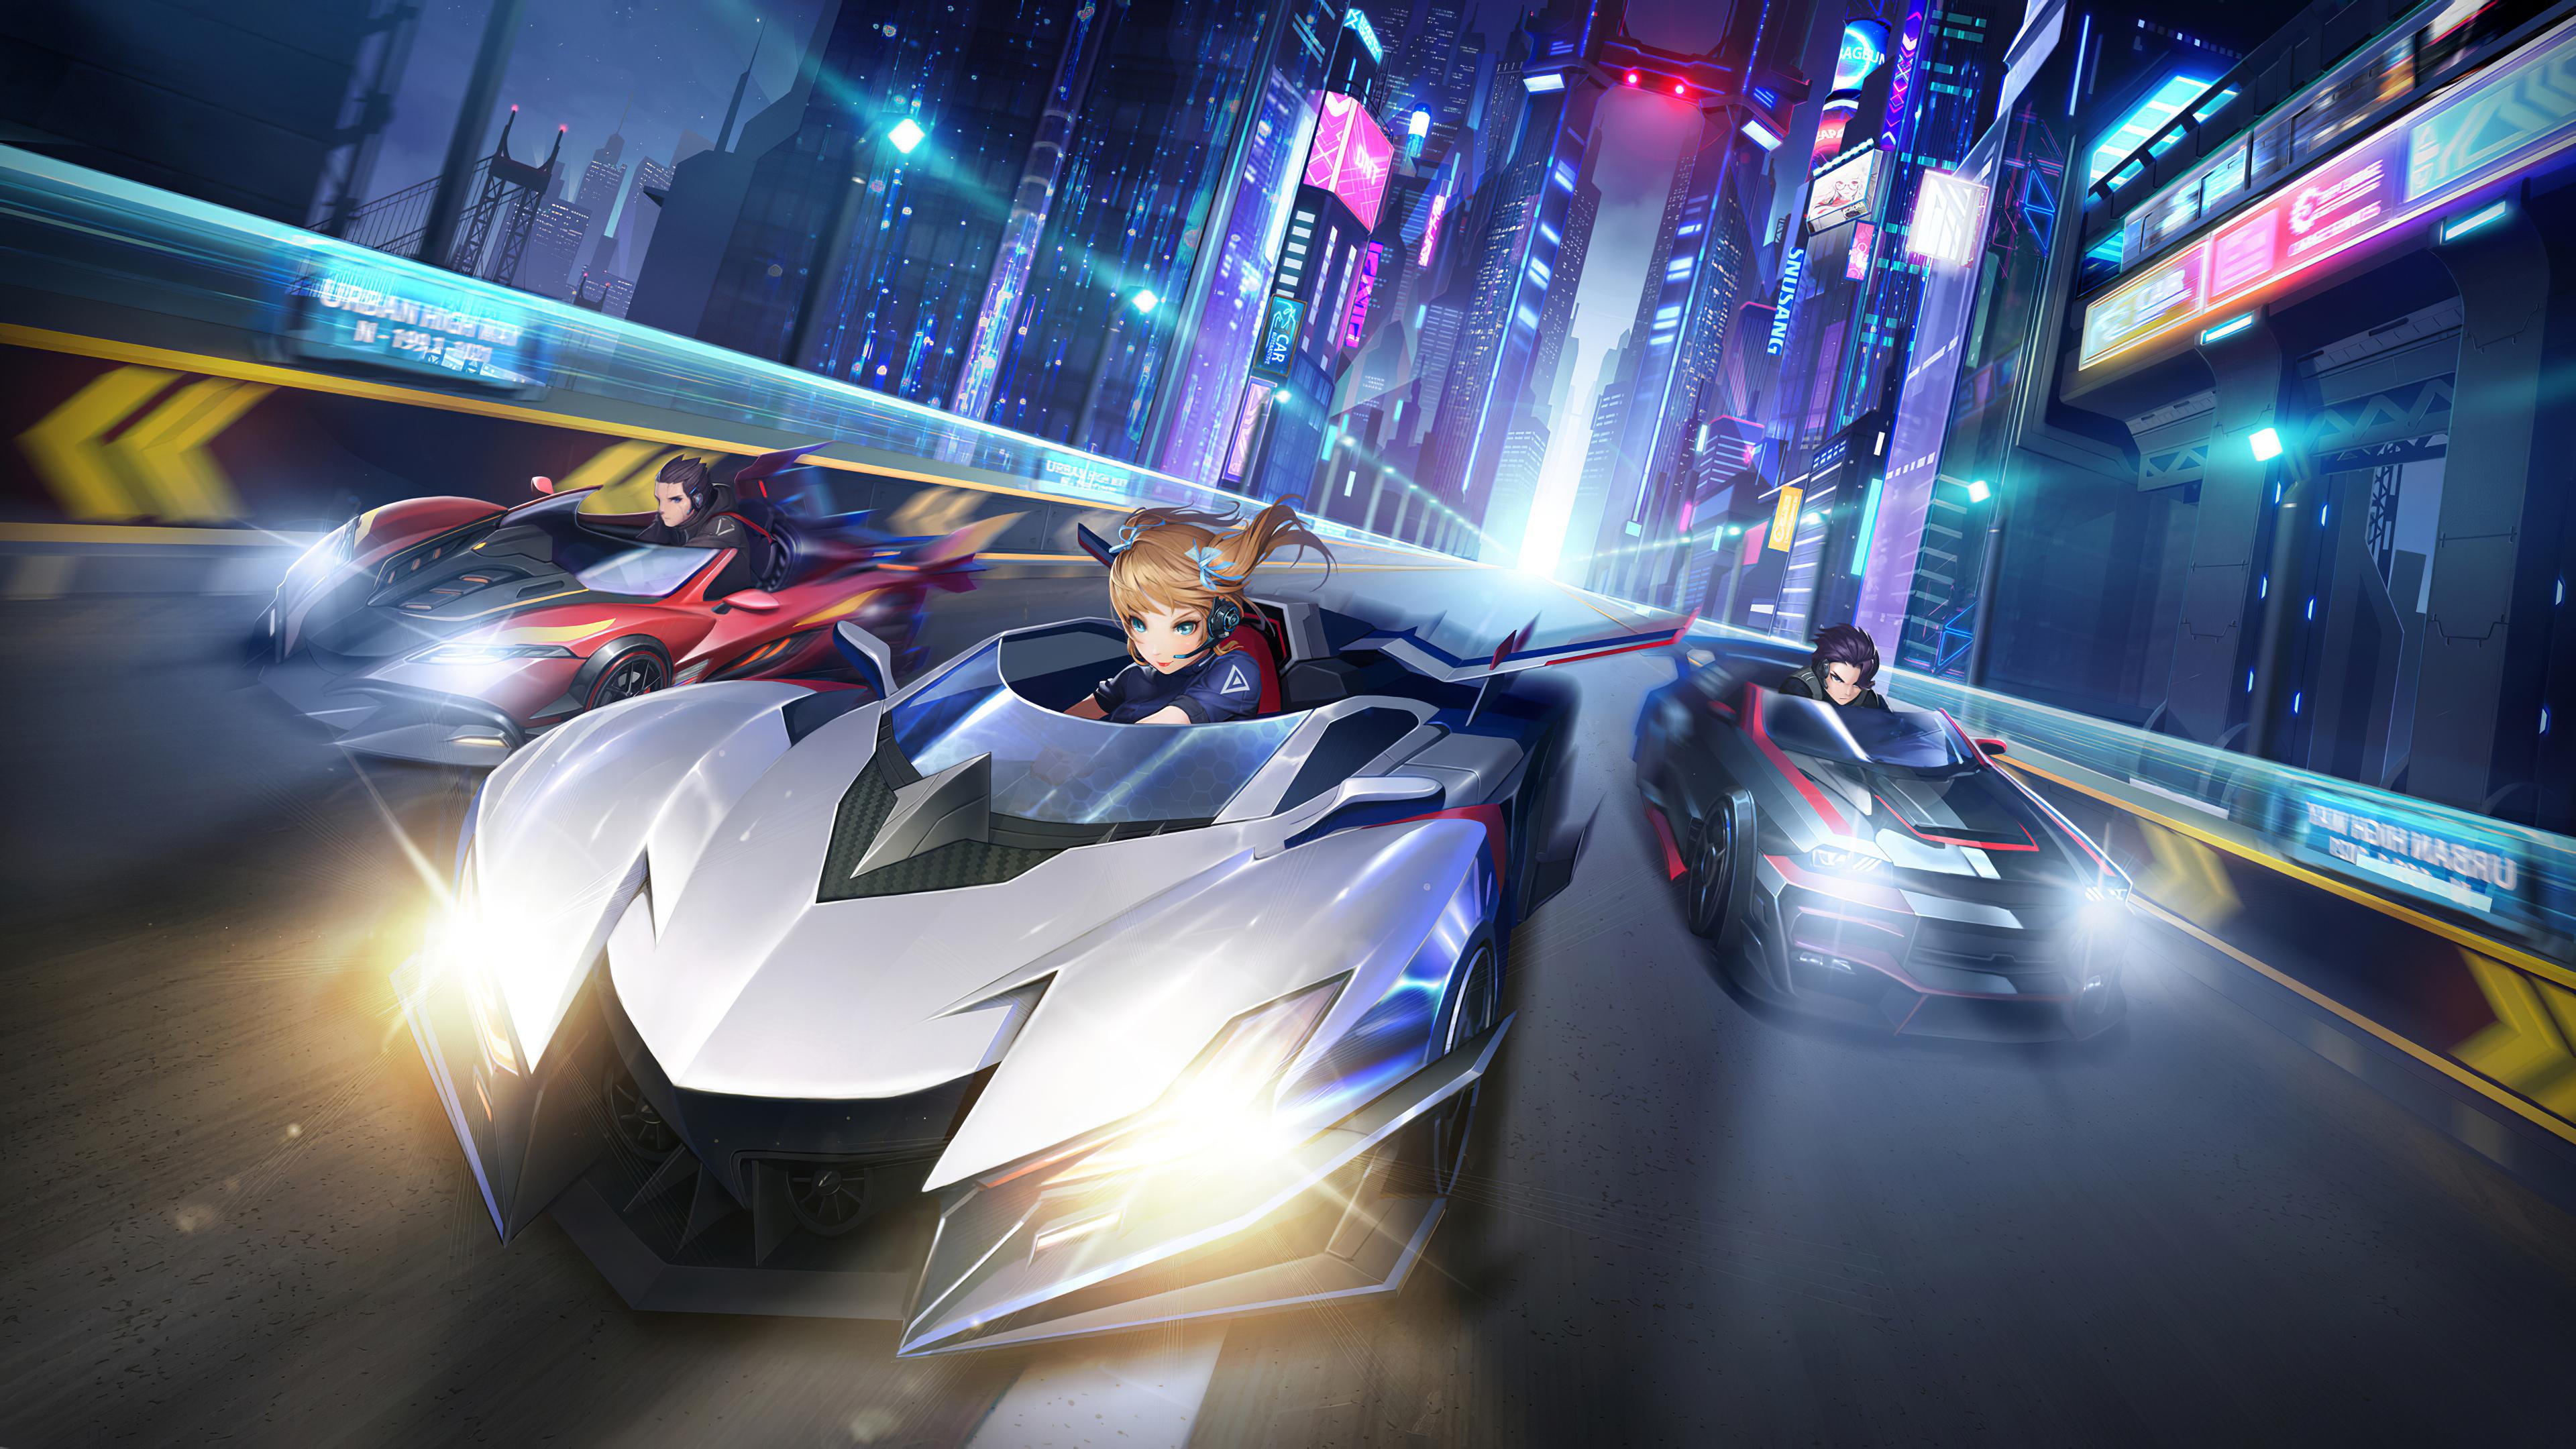 City Street Racing Anime 4k, HD Anime, 4k Wallpapers ...